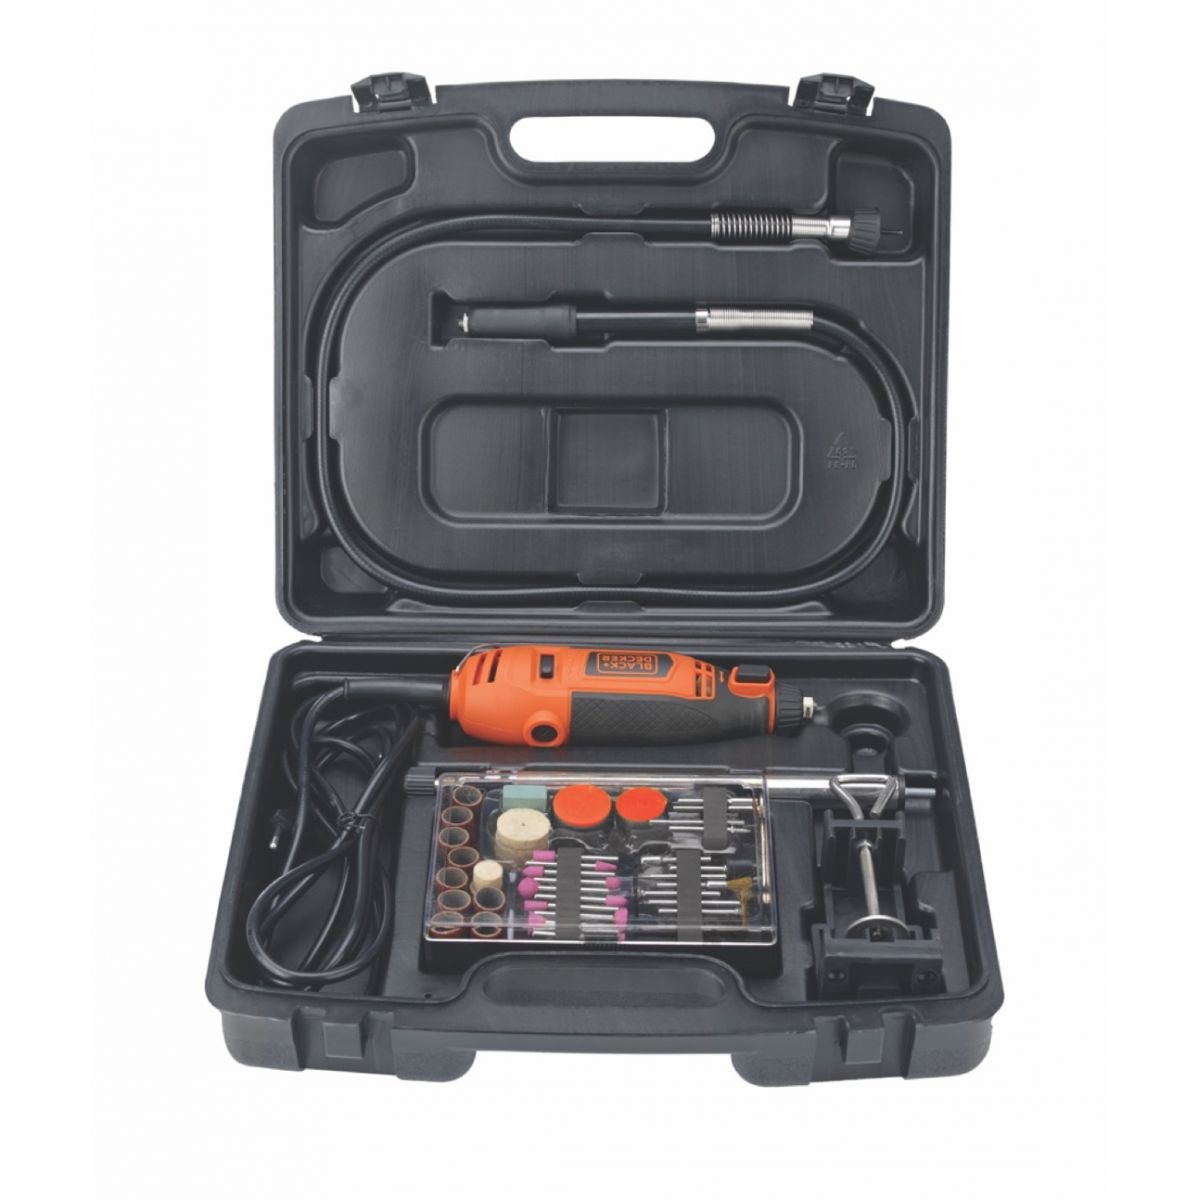 Micro Retífica Black & Decker RT18KA + eixo flexível + kit com 110 peças